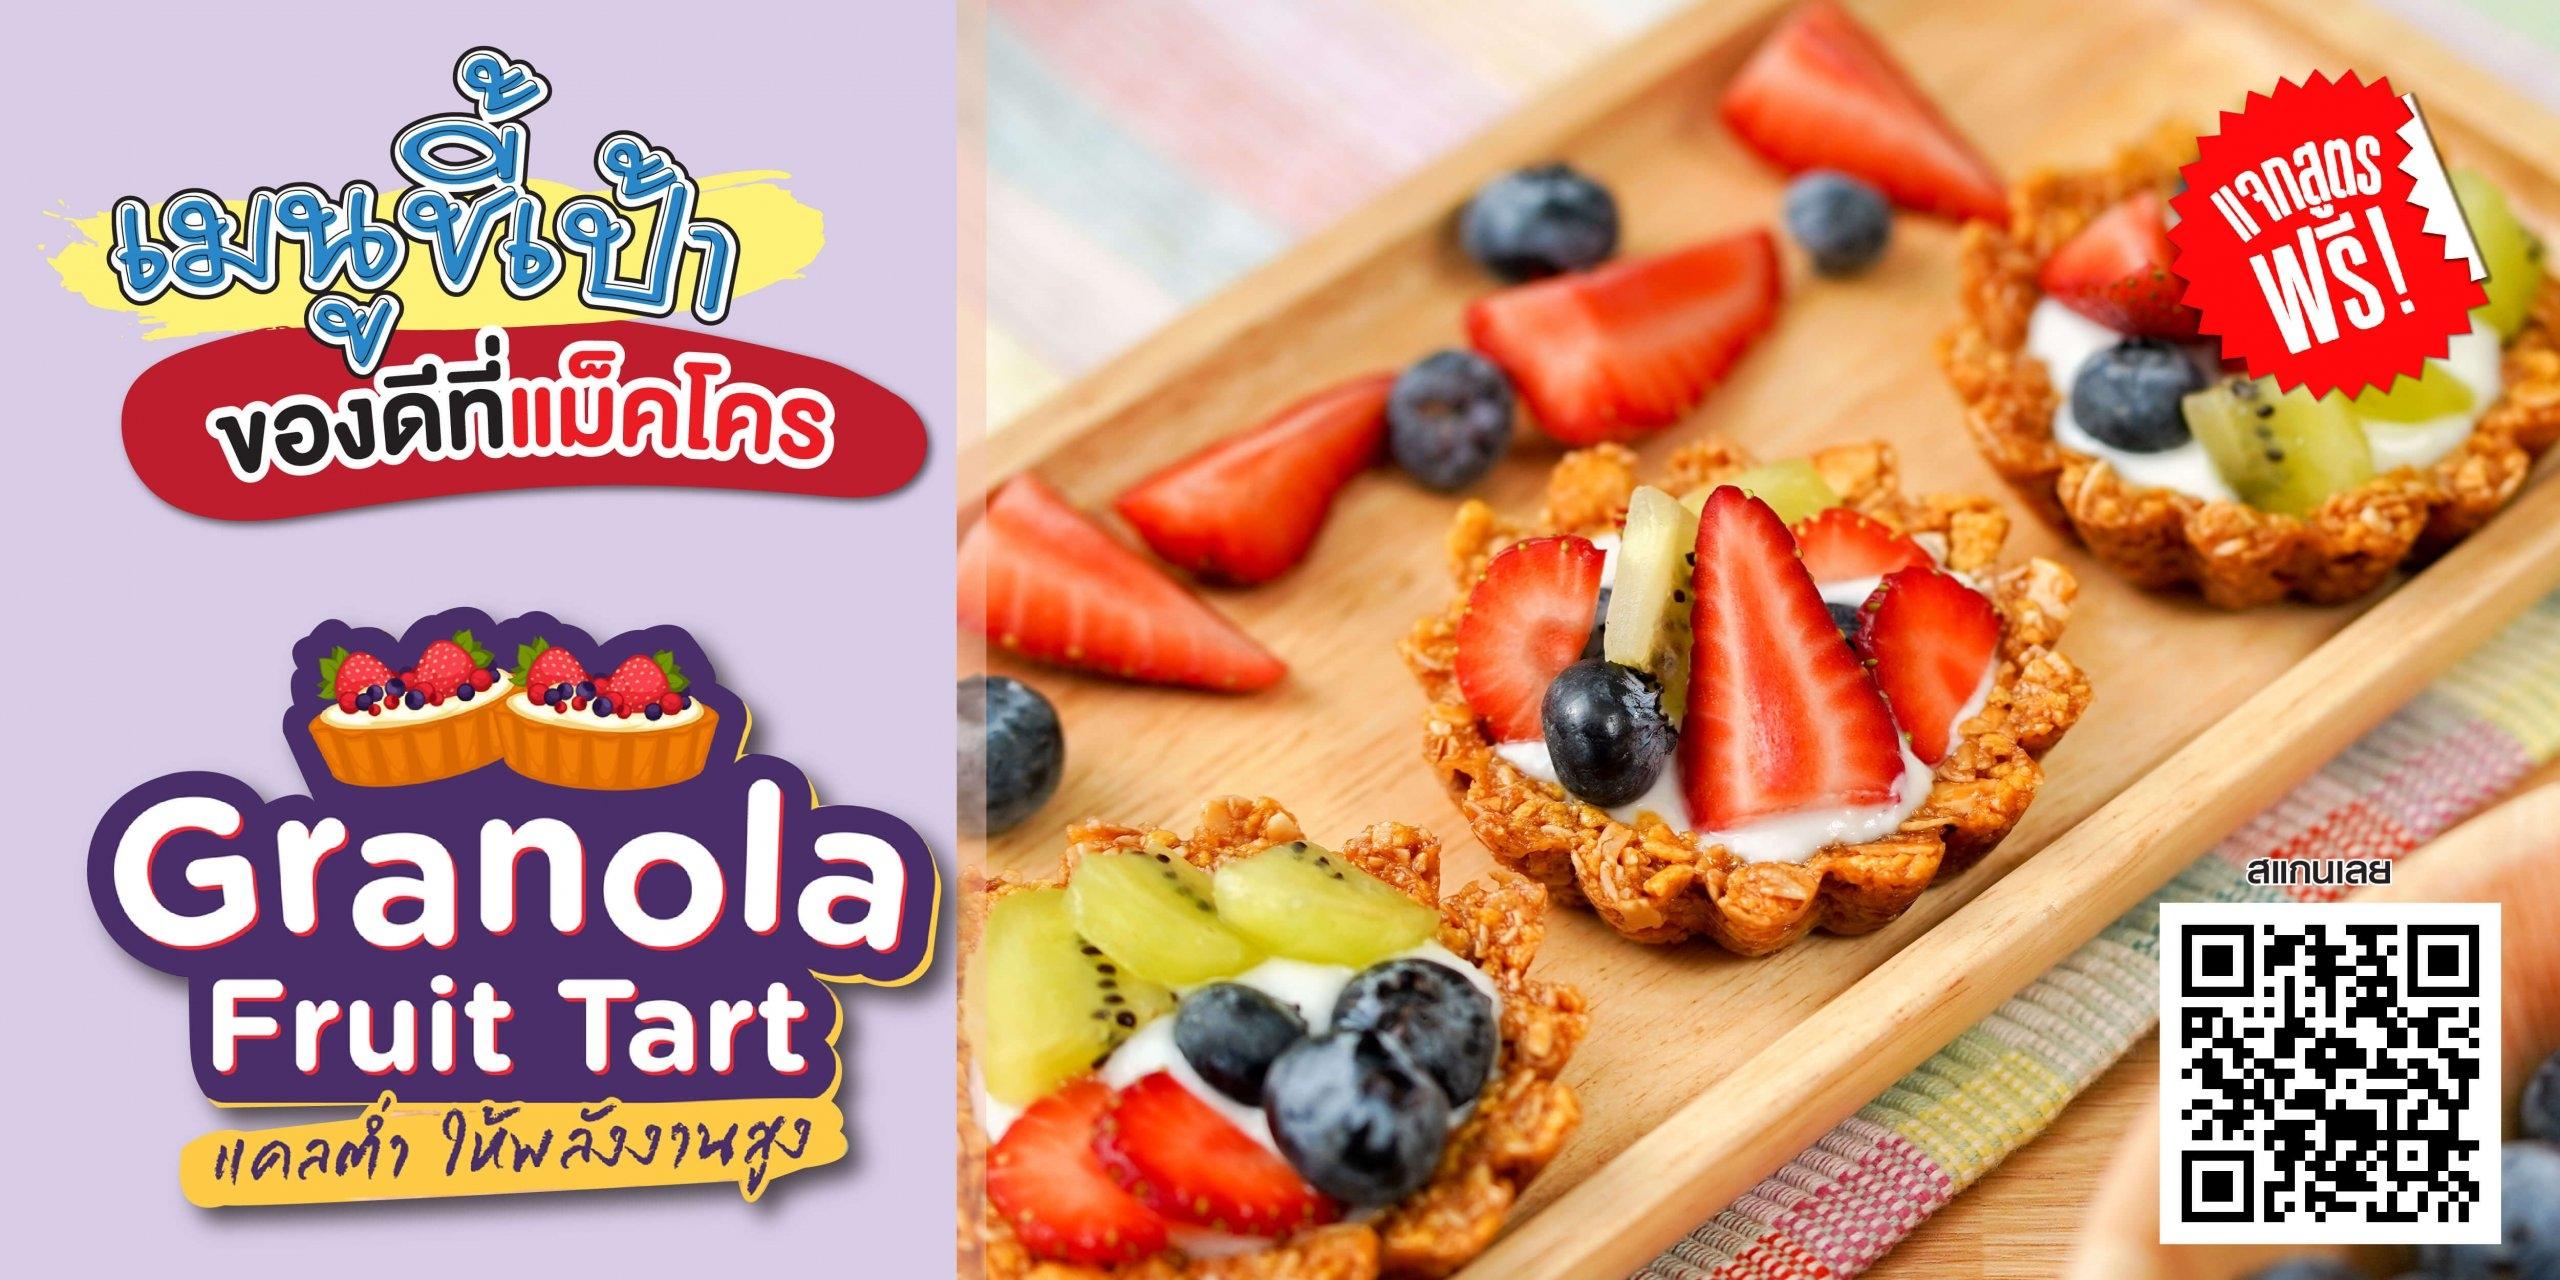 Granola fruit tart